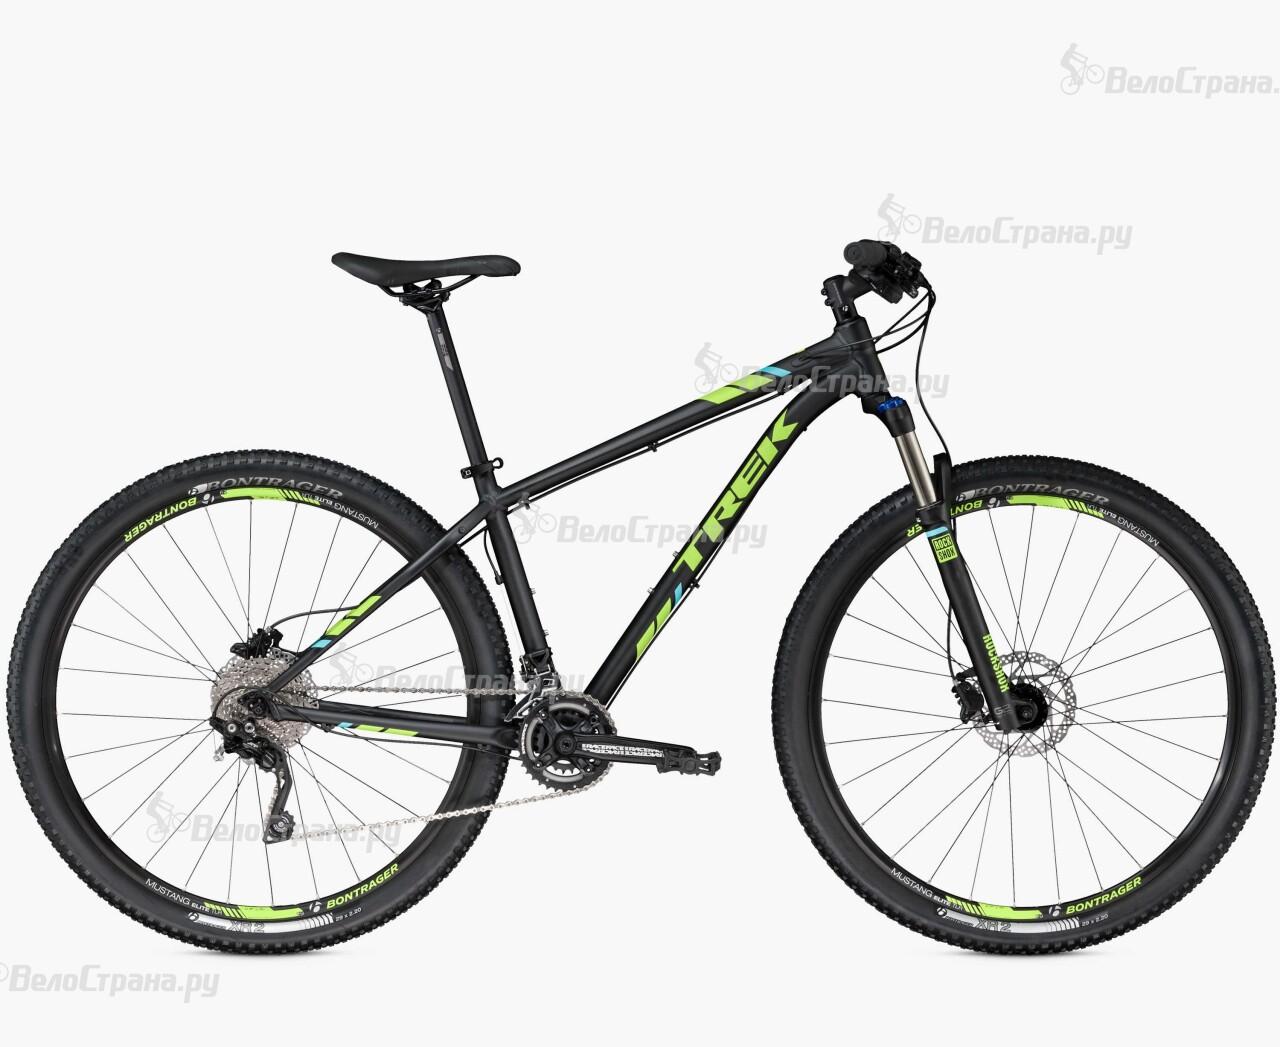 Велосипед Trek X-Caliber 9 29 (2016) велосипед trek fuel ex 9 29 2017